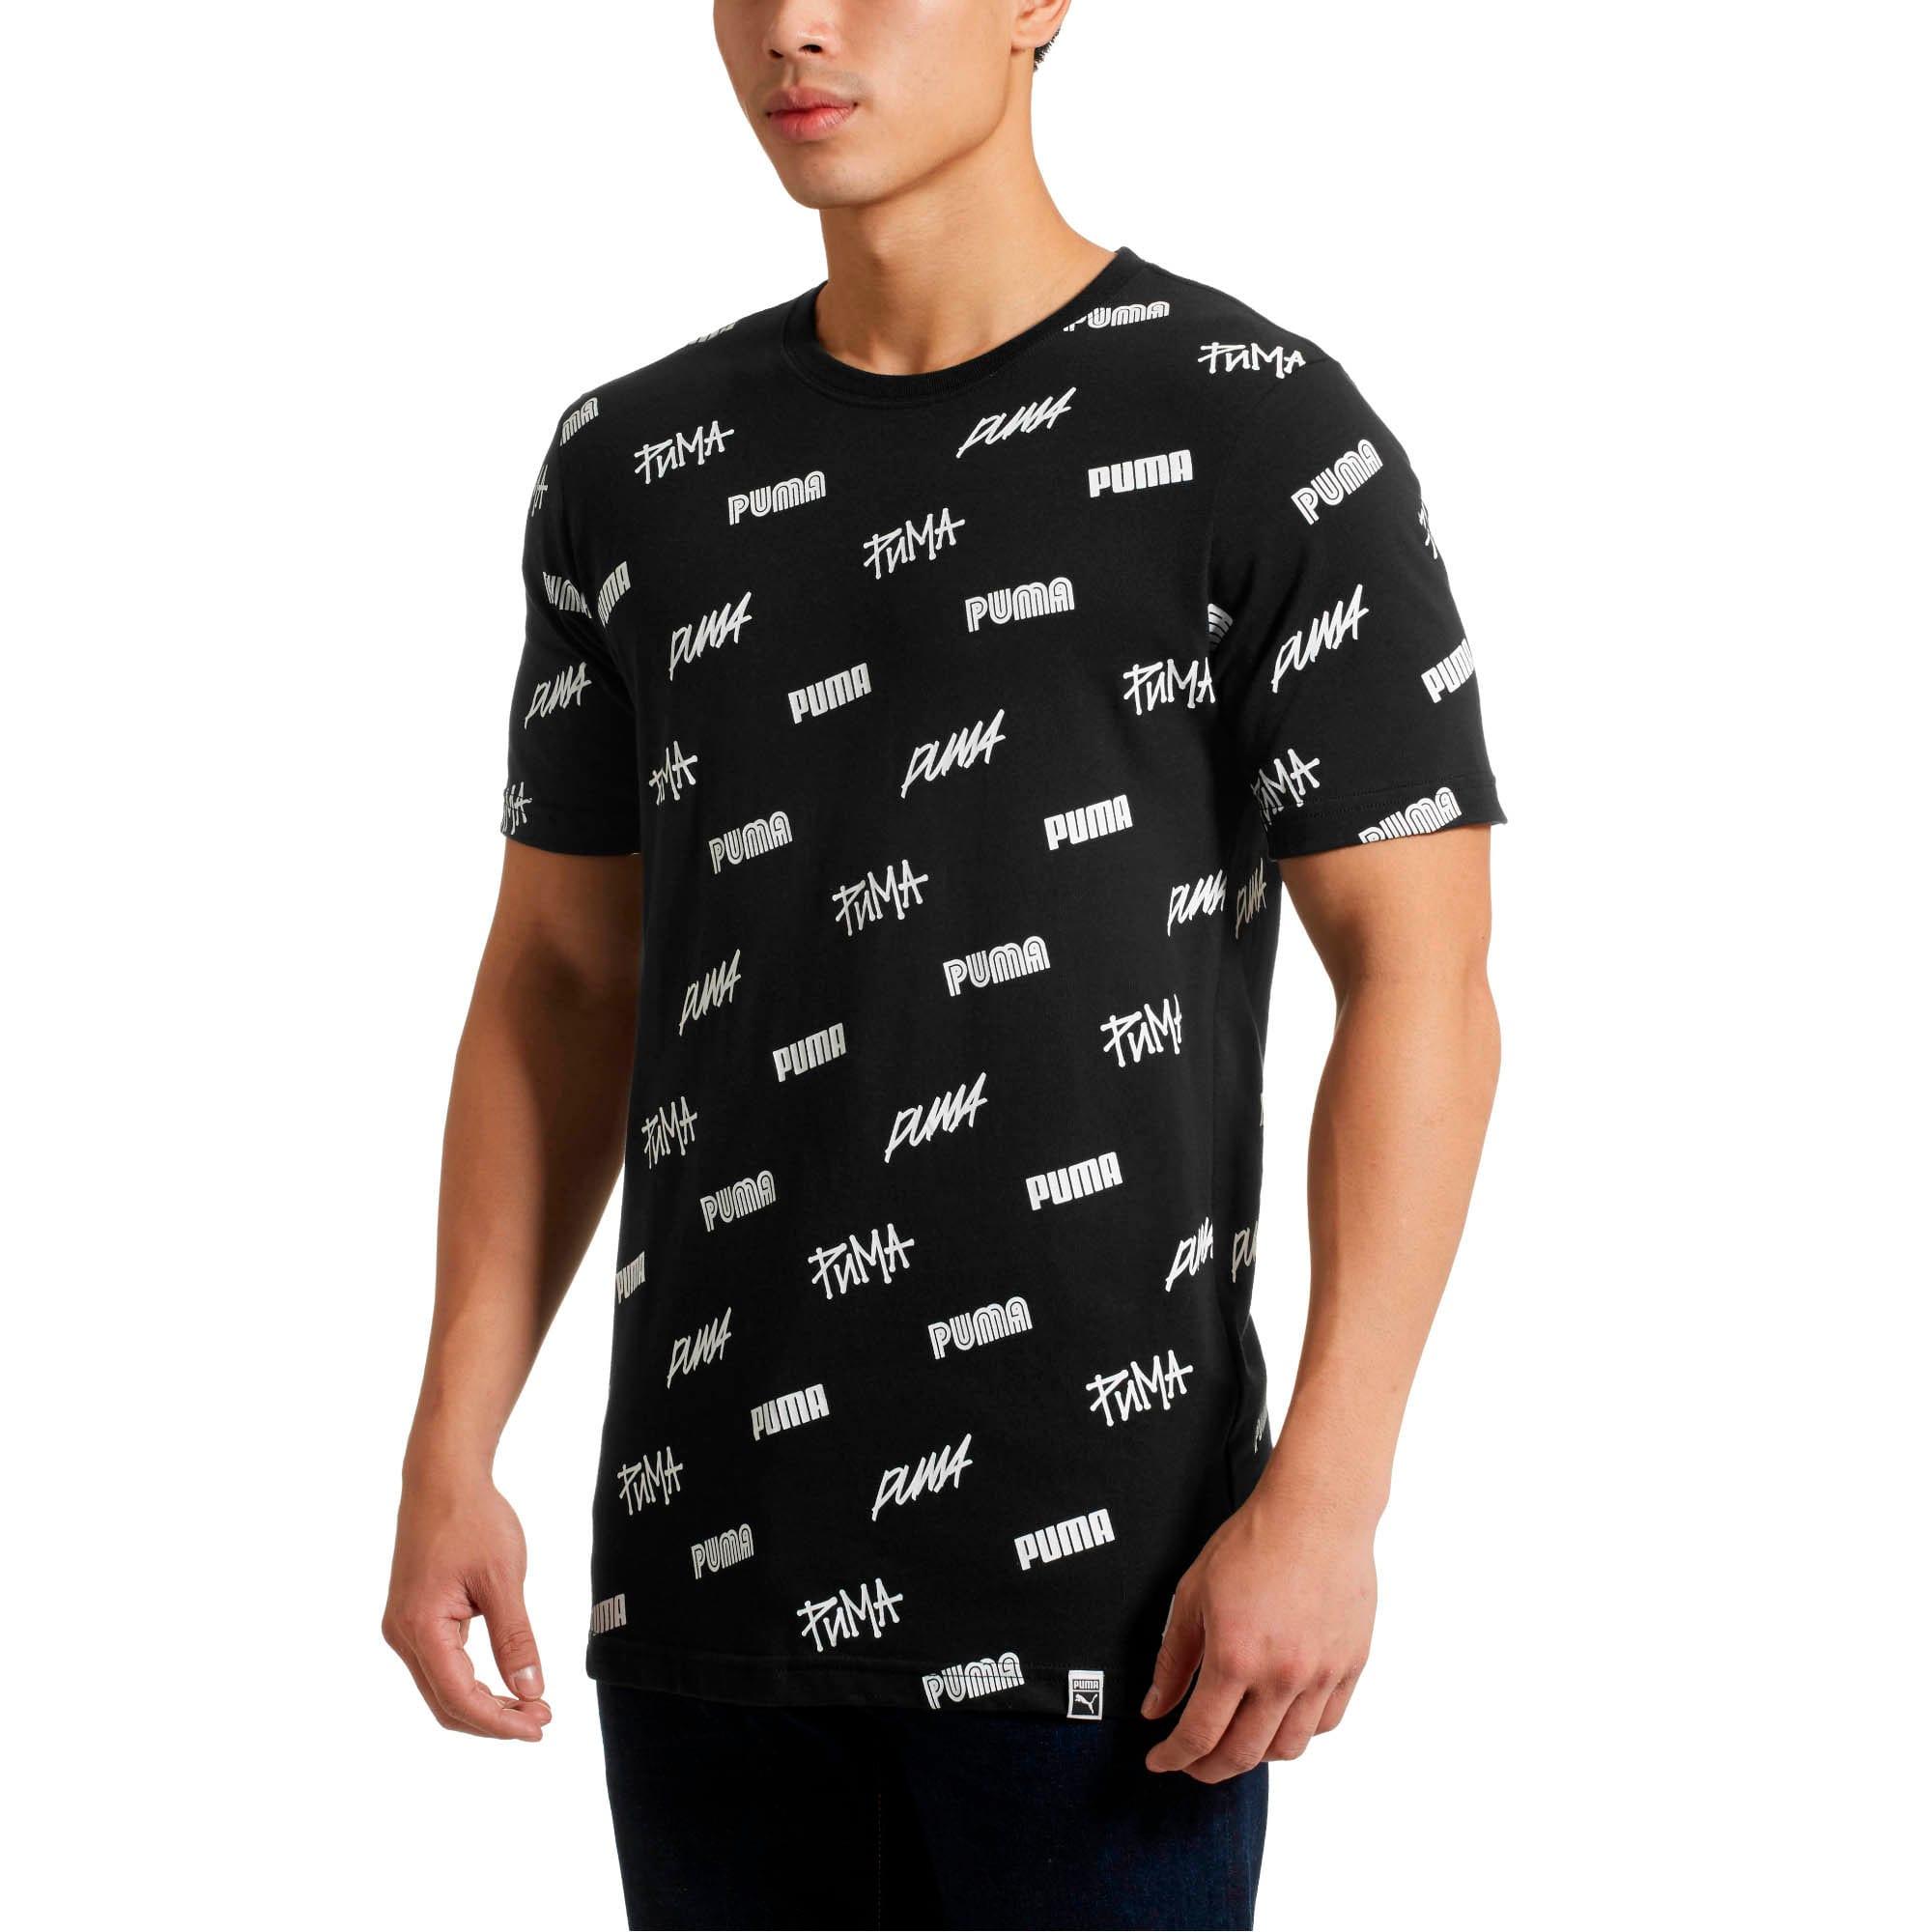 Thumbnail 2 of All Over SS T-Shirt, Puma Black-White, medium